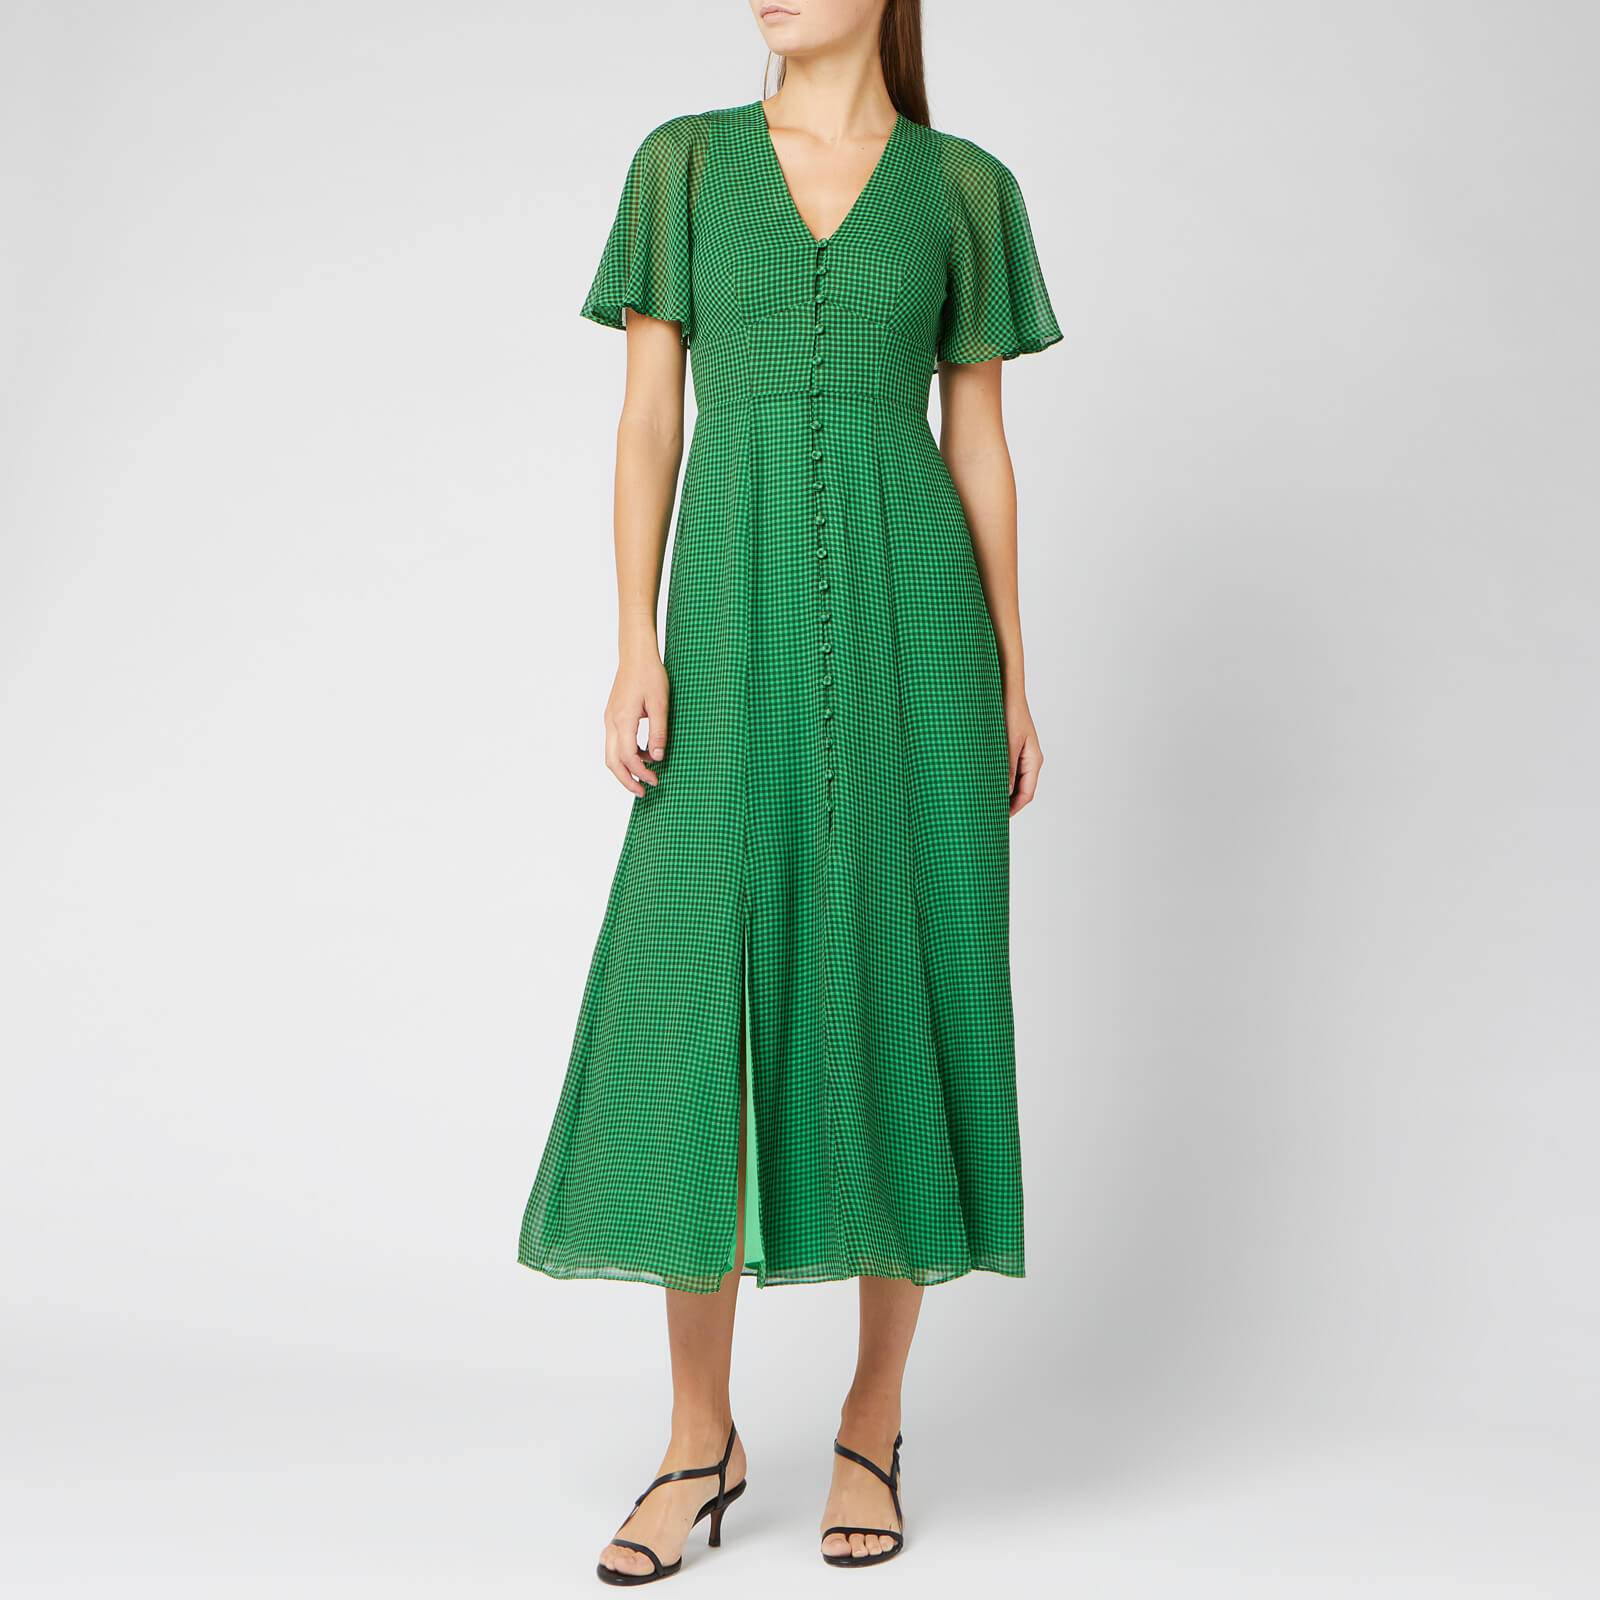 Whistles Women's Cecily Check Dress - Green/Multi - UK 8 - Green